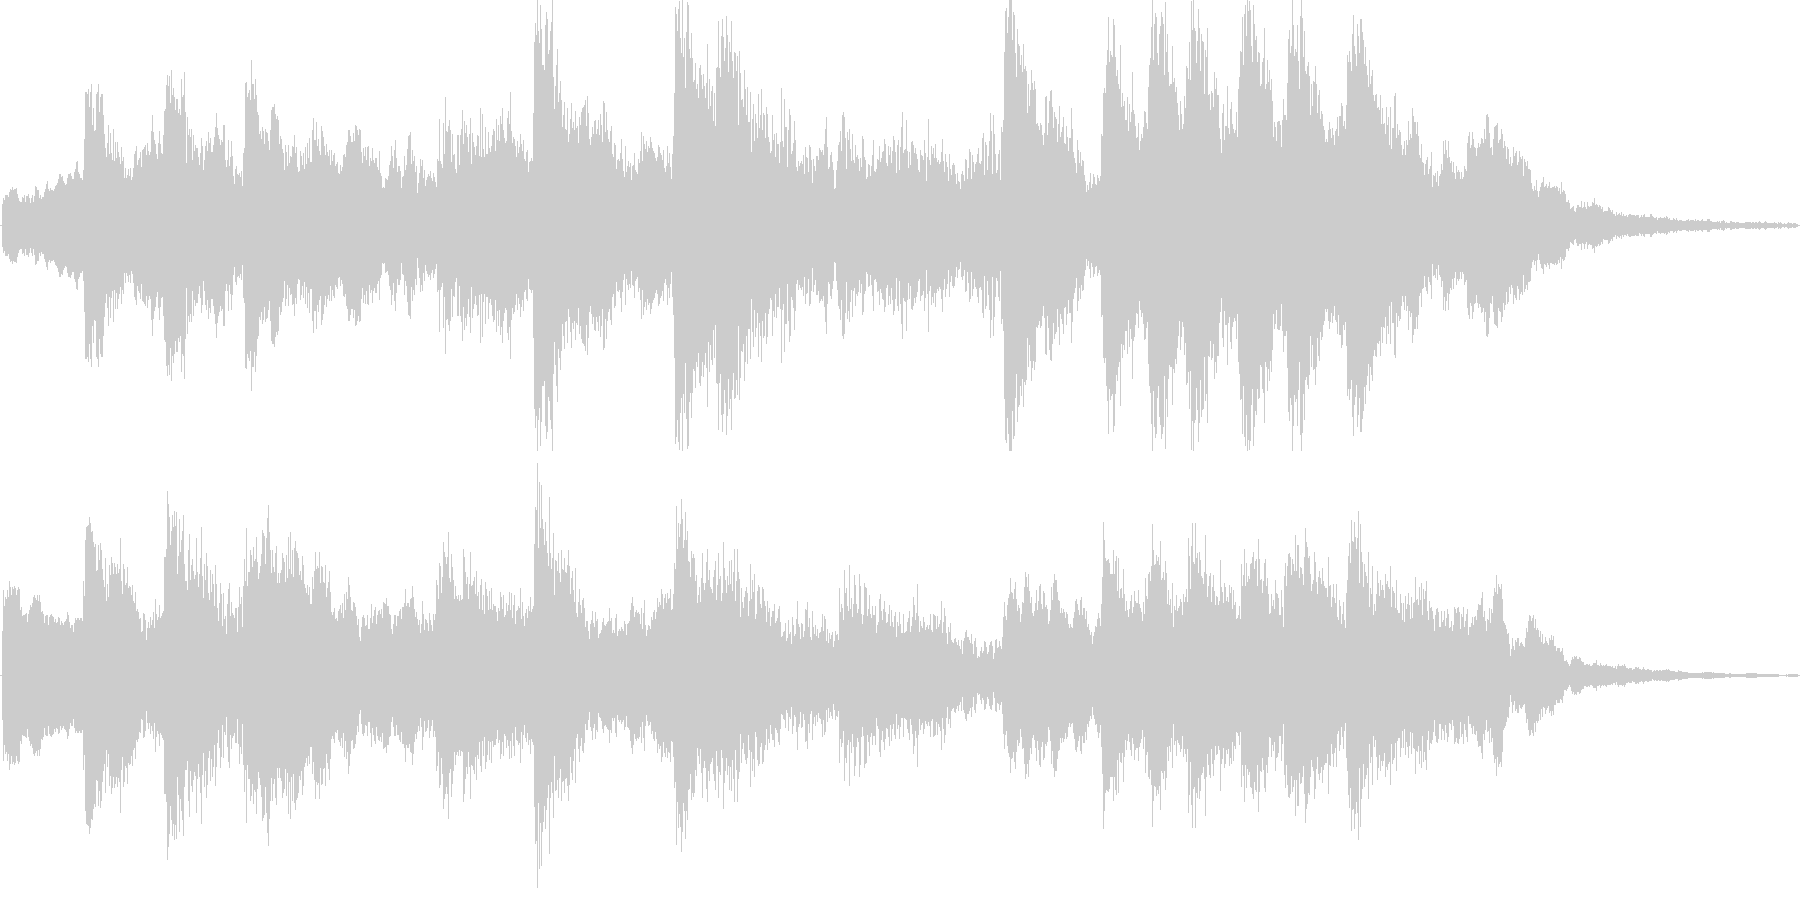 SpychoなFXとロンリーなピアノの未再生の波形